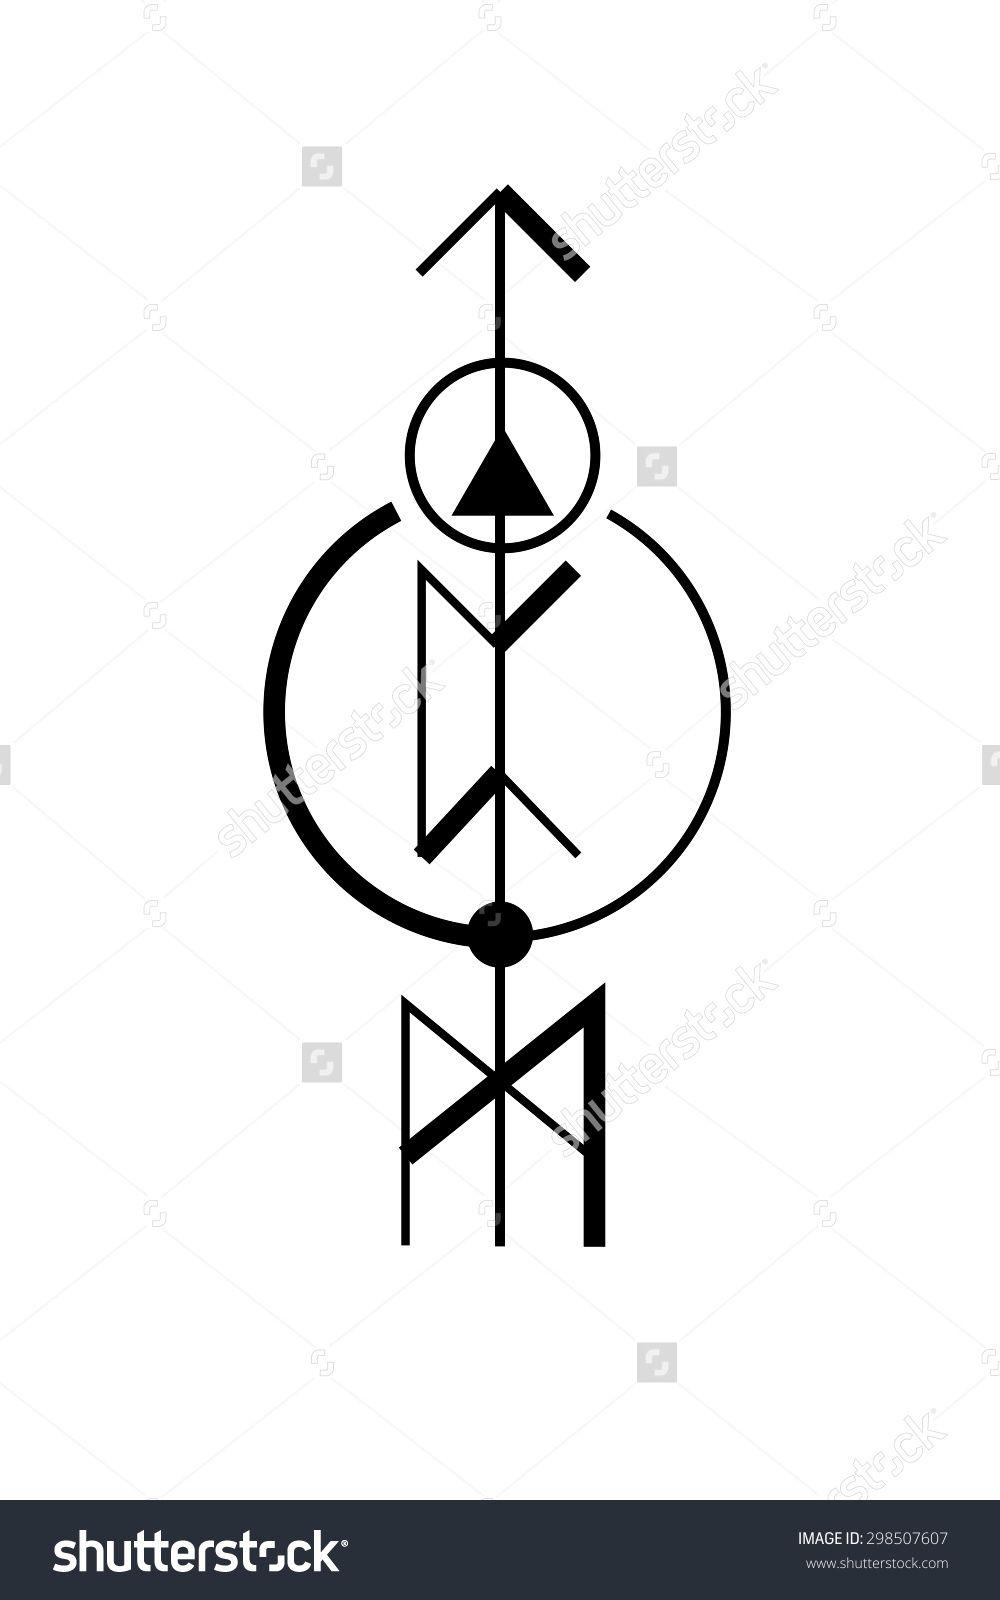 Geometry symbols tattoos sacred geometry magic runic symbol geometry symbols tattoos sacred geometry magic runic symbol tattoo buycottarizona Choice Image